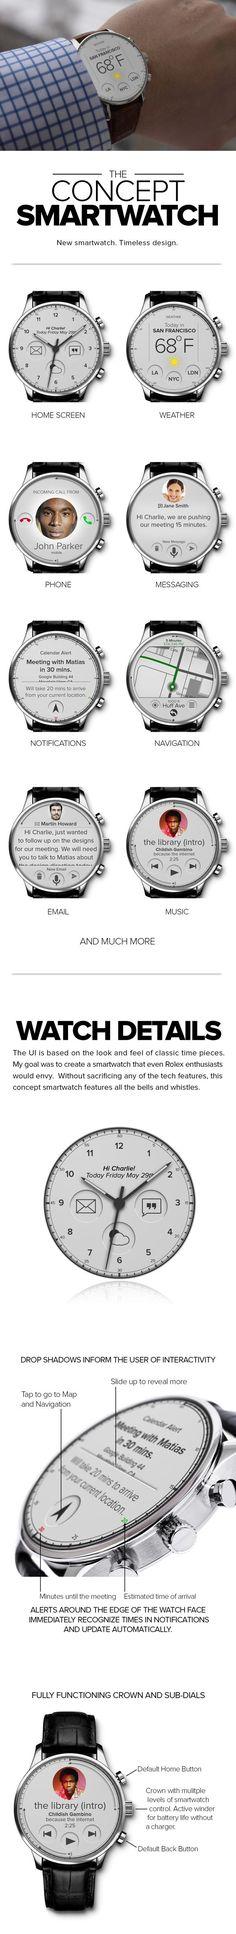 CONCEPT SMARTWATCH by Charlie No, via Behance